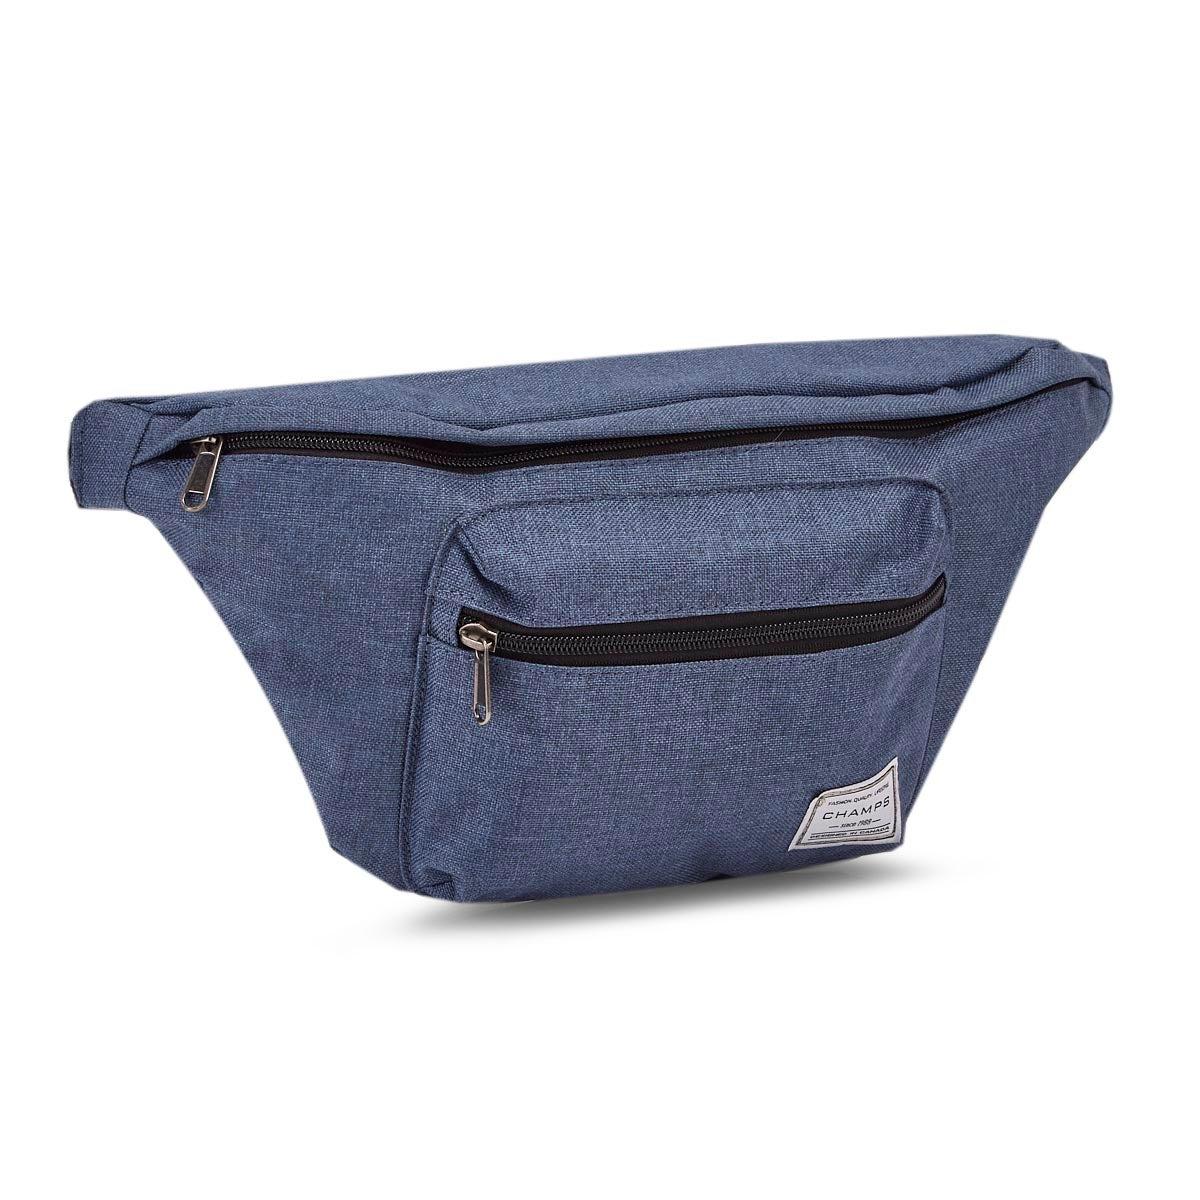 Unisex blue oversized waist pack